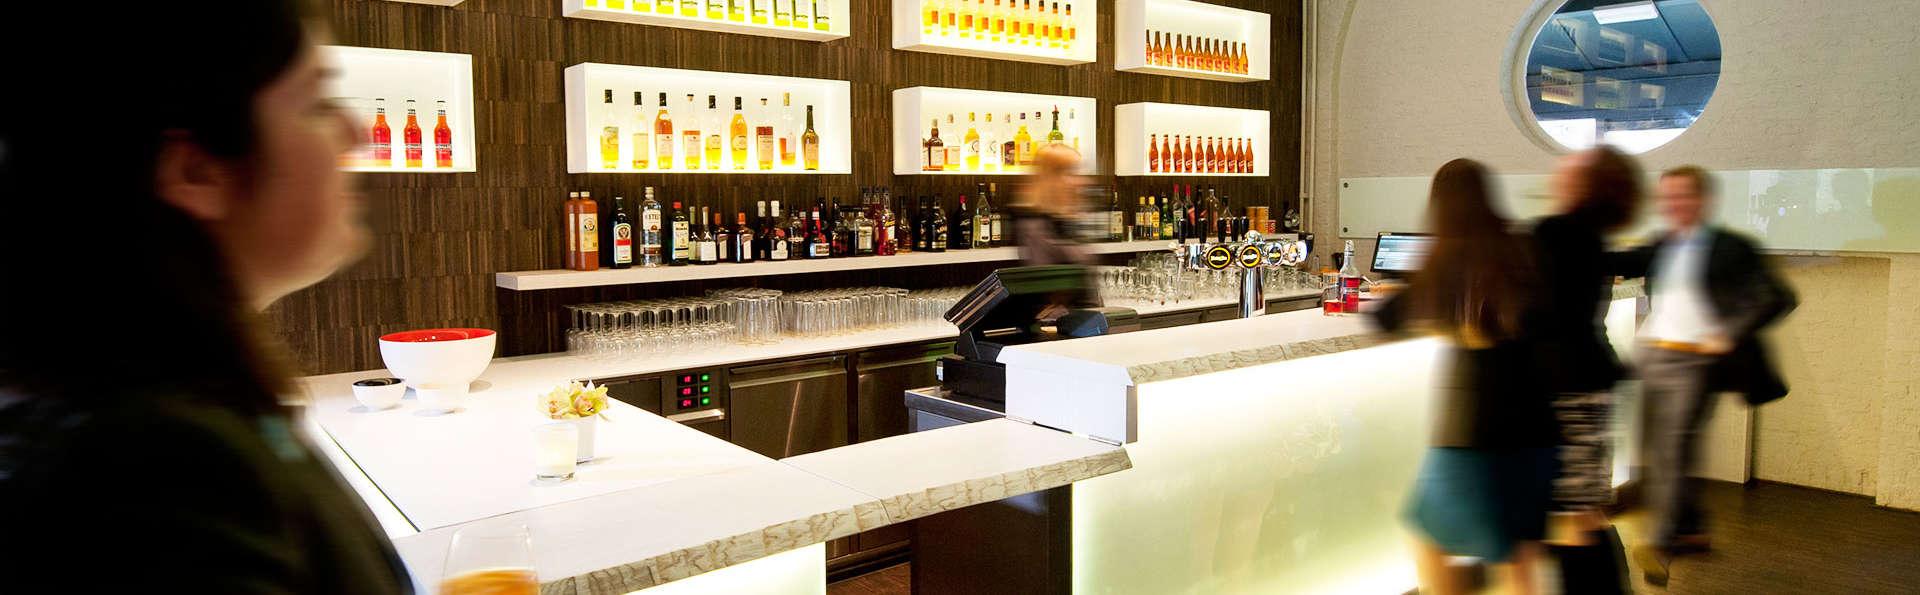 Landgoed Kapellerput - edit_Hotelbar-restaurant-Kapellerput-_1_.jpg